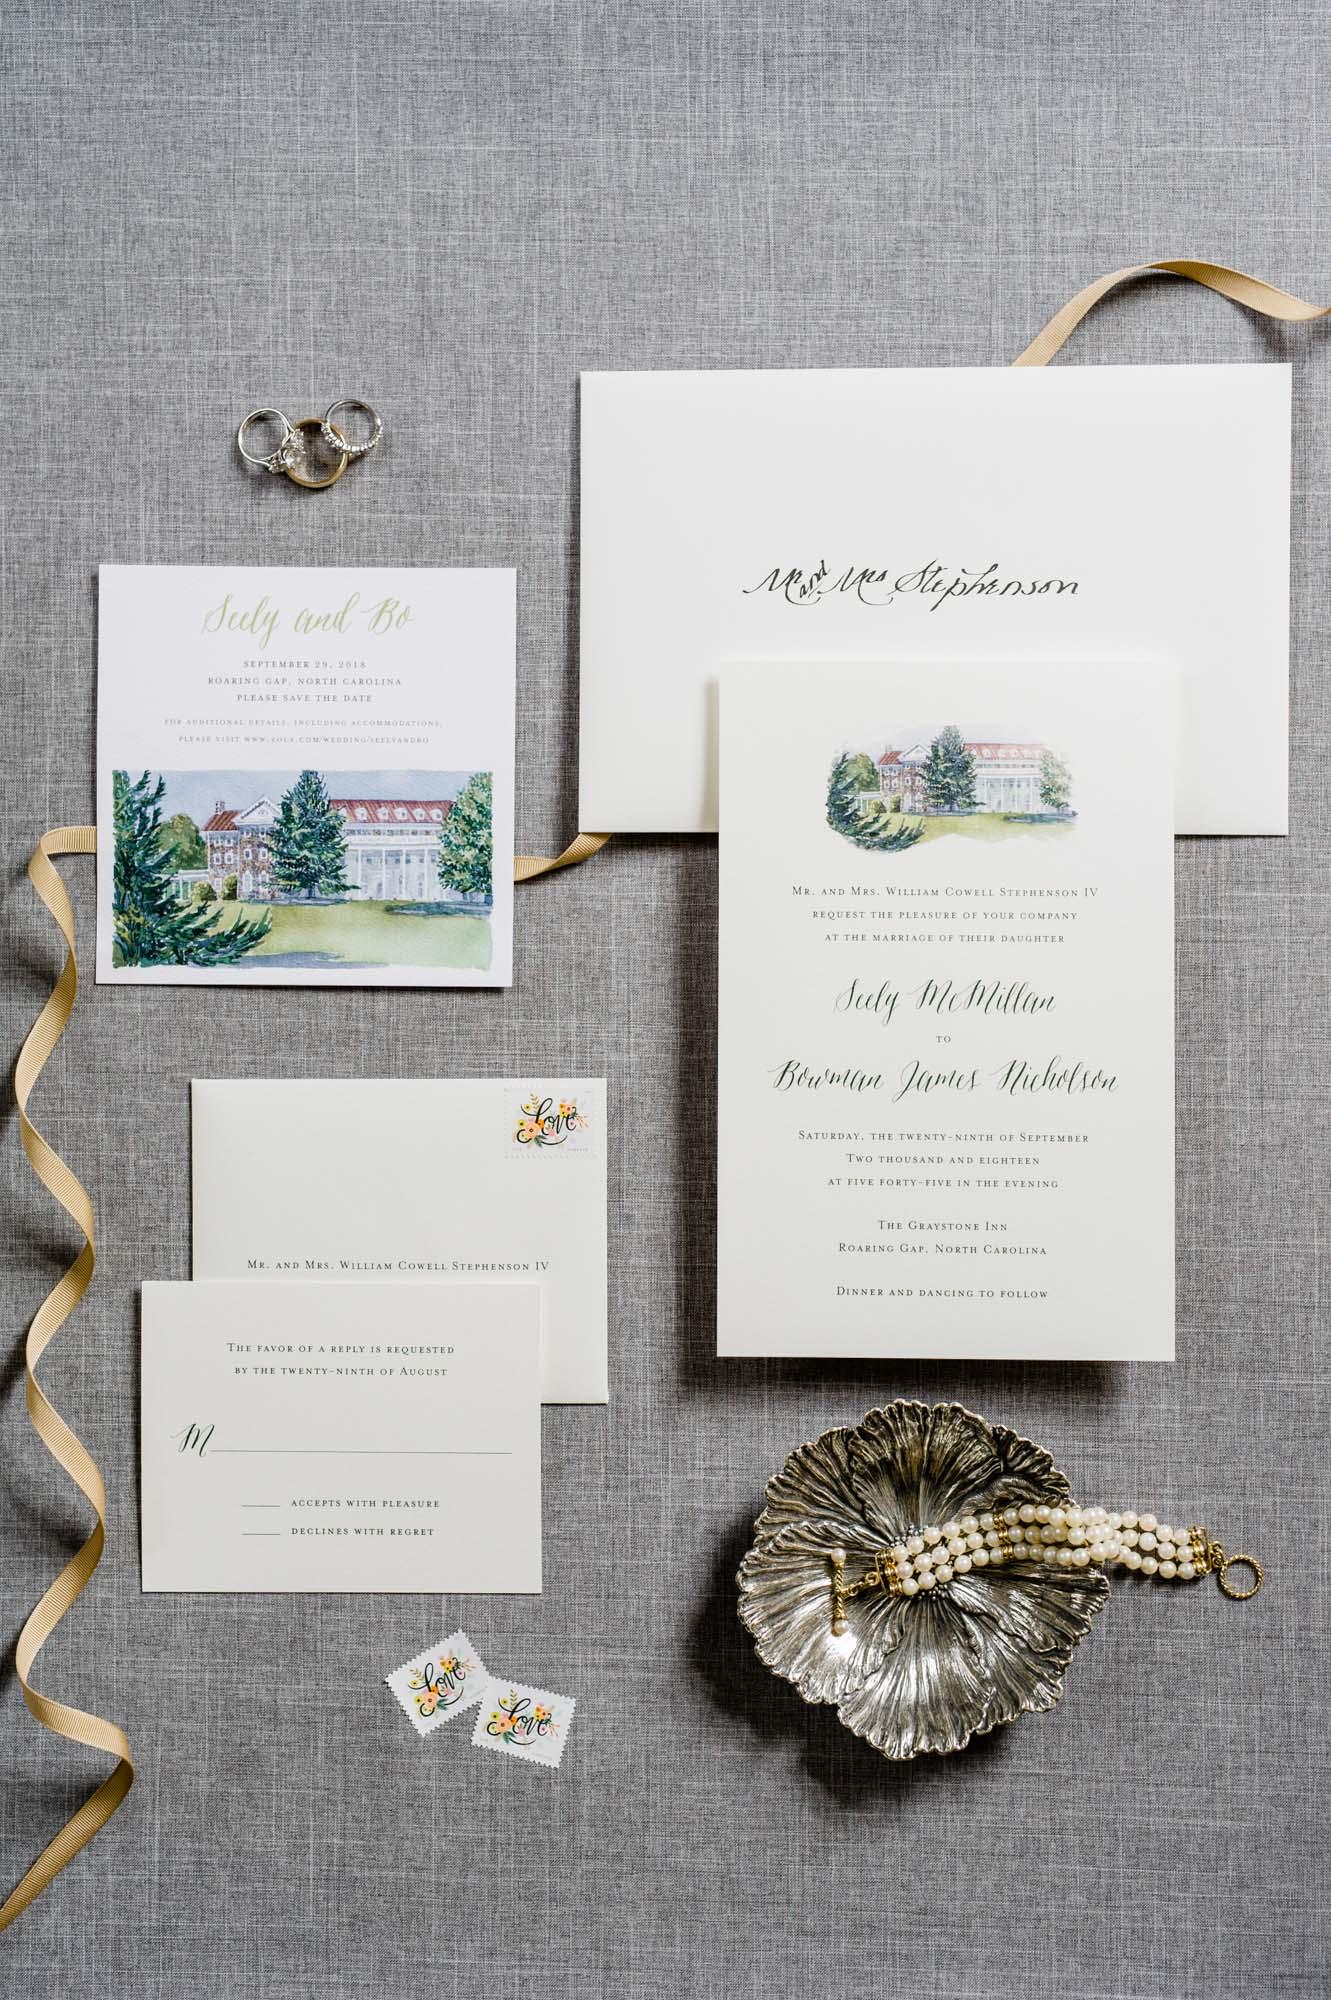 Nicholson_Wedding_Low_Resolution_2018_329.jpg